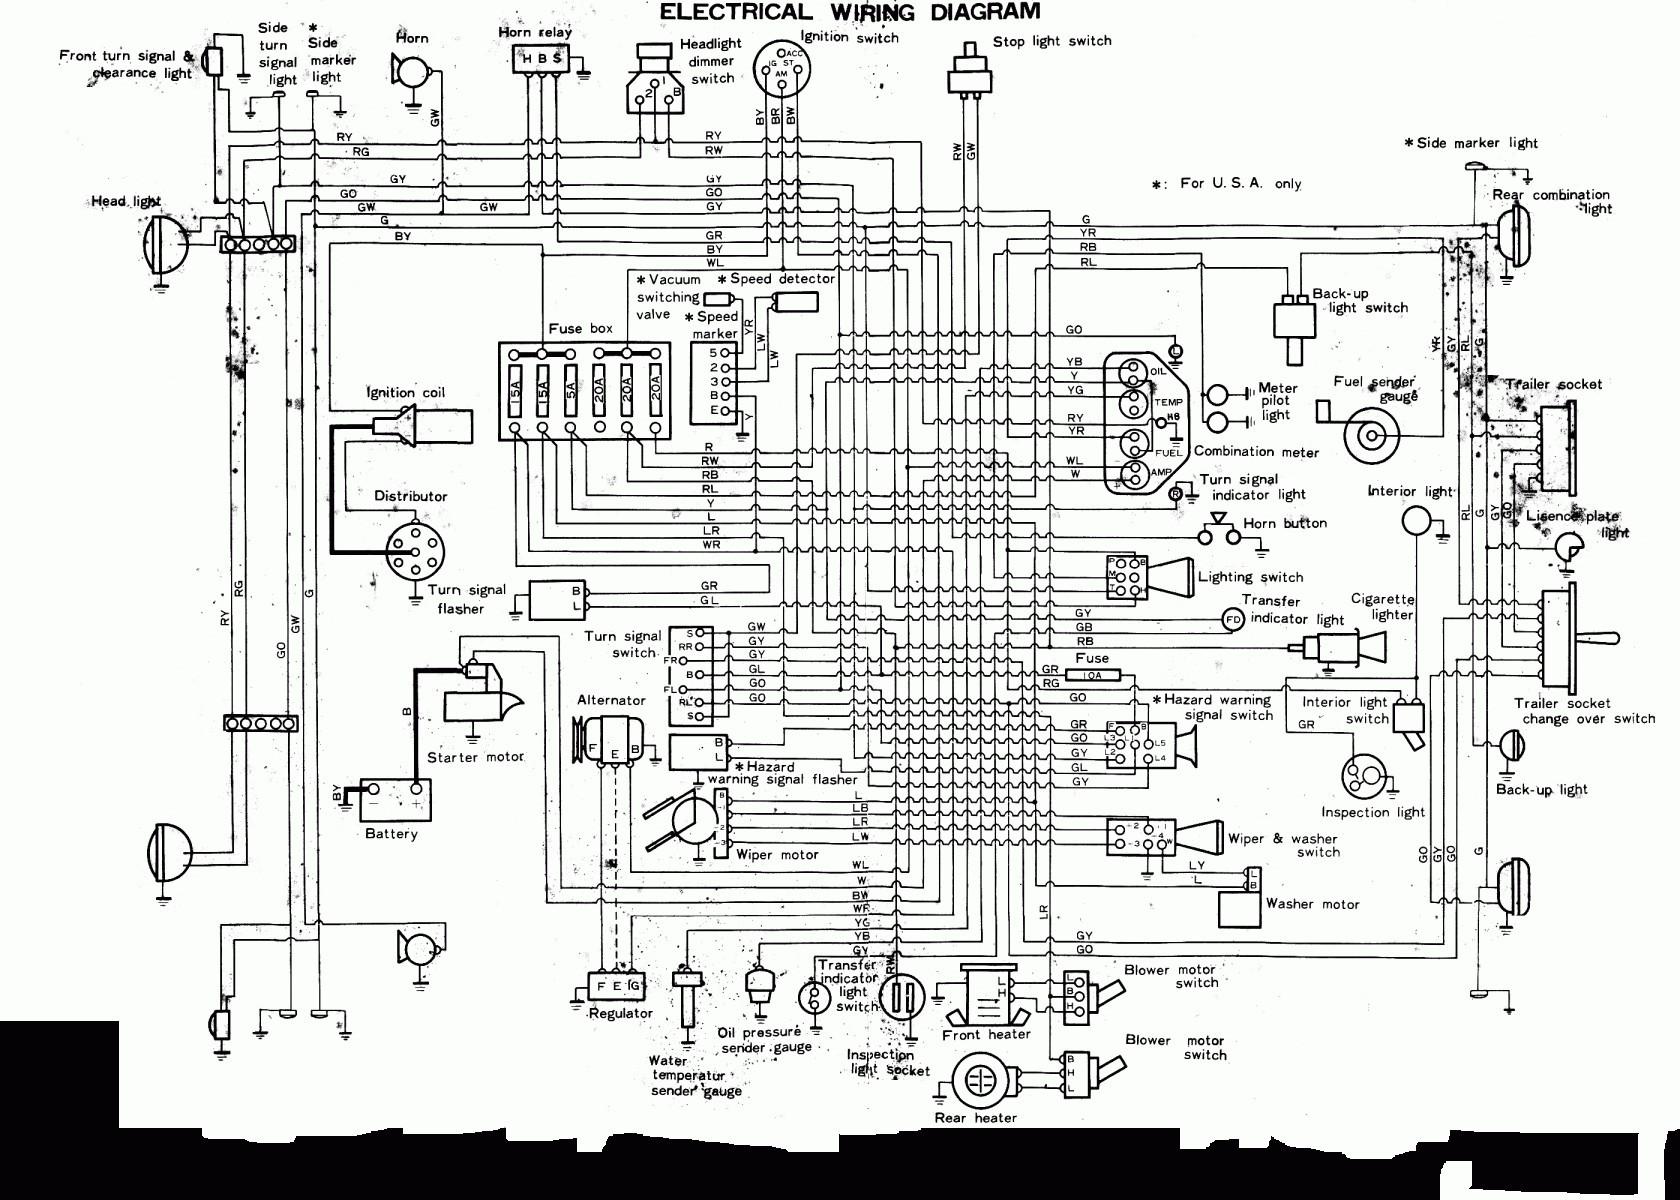 79 series landcruiser headlight wiring diagram